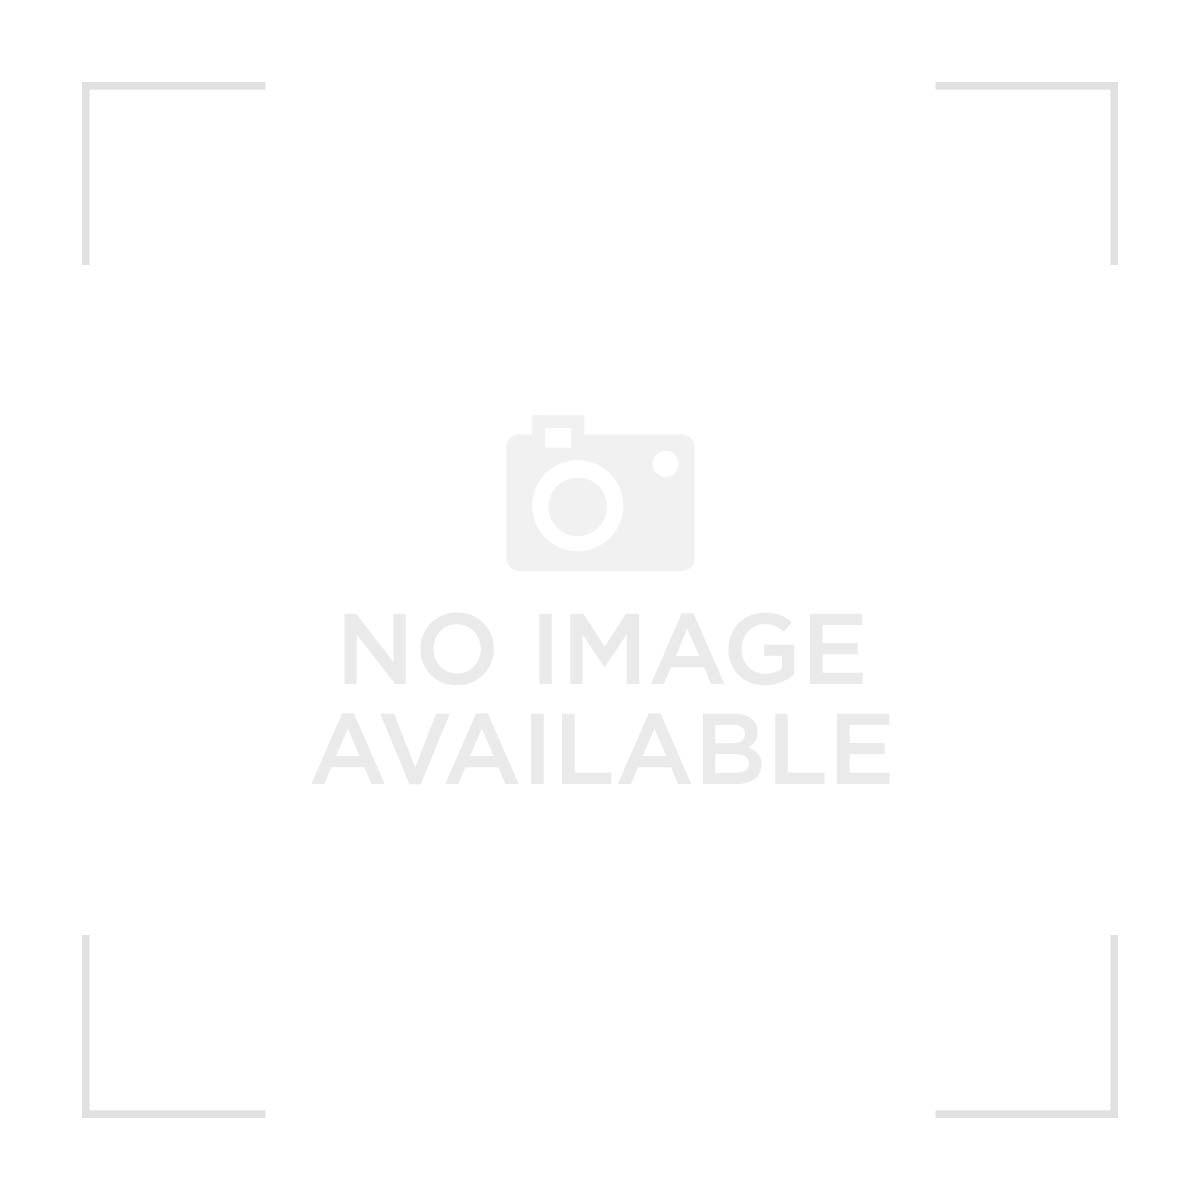 Kii Rosemary & Pistachio Crisps 5.3 OZ